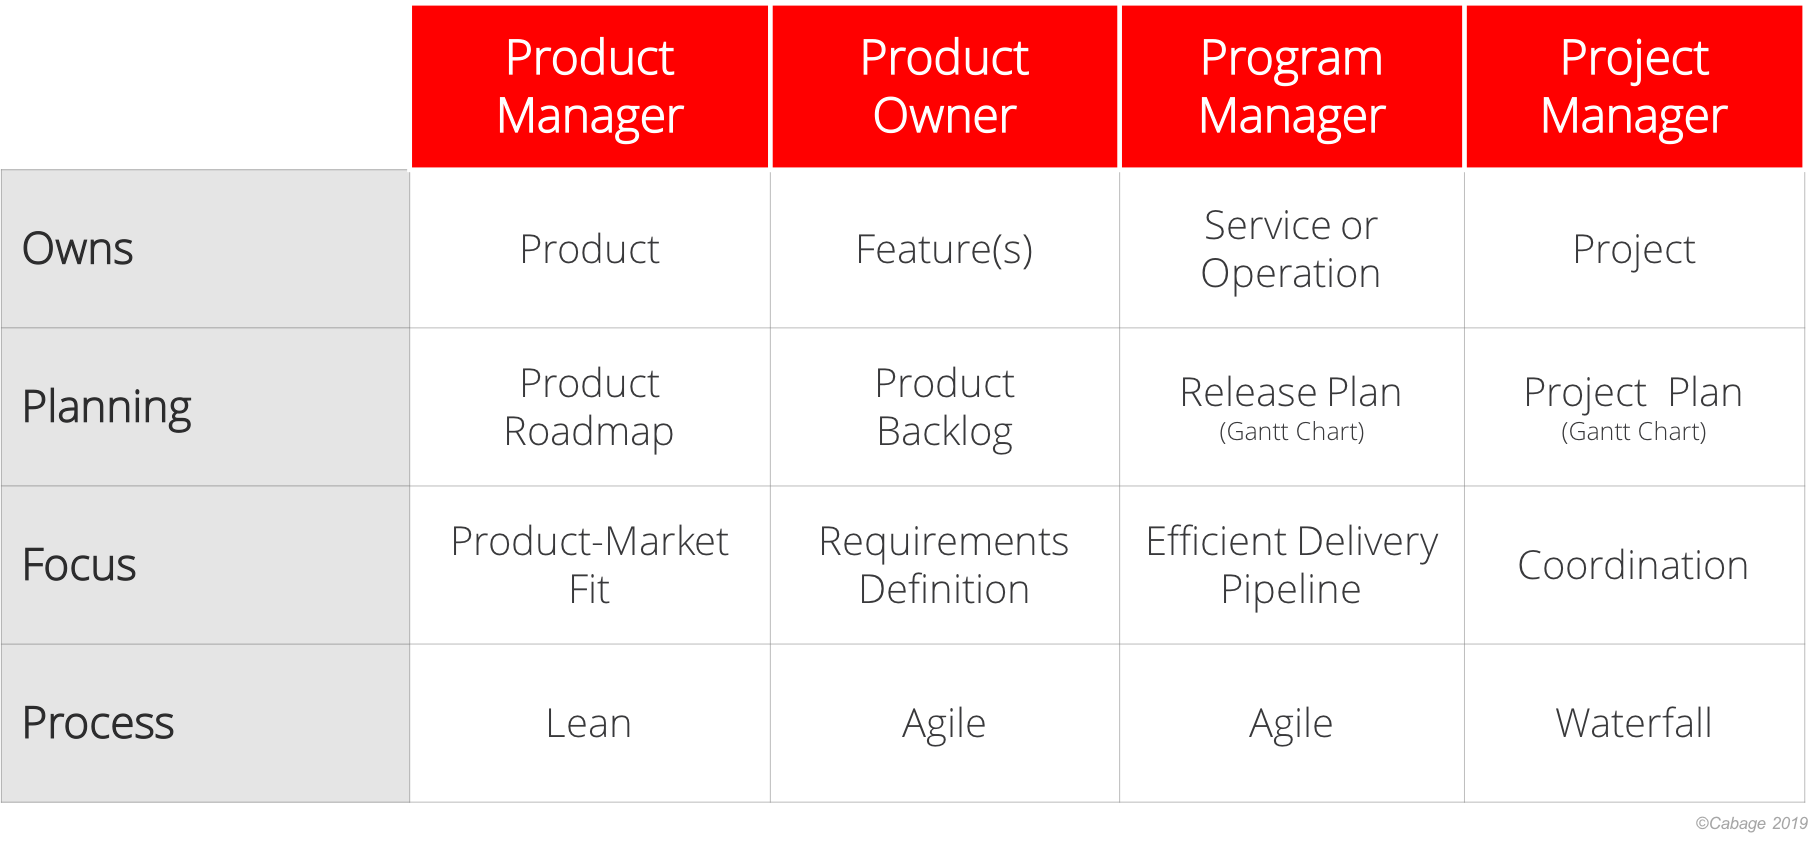 Agile Scrum Project Management Certification product vs project vs program management | neal cabage